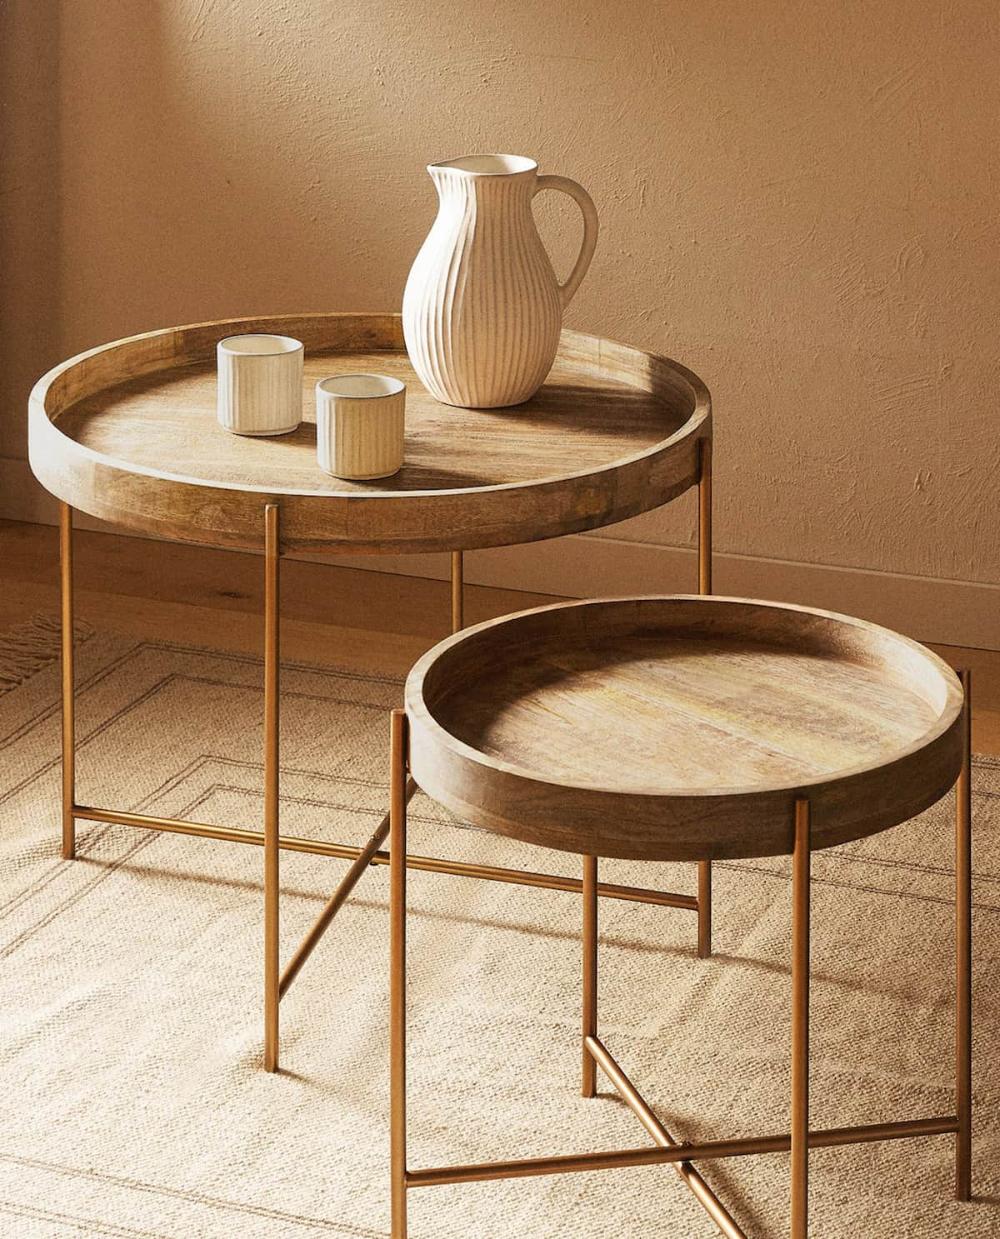 Ptyssomeno Trapezi Me Disko Coffee Table Ikea Nesting Tables Folding Table [ 1239 x 1000 Pixel ]